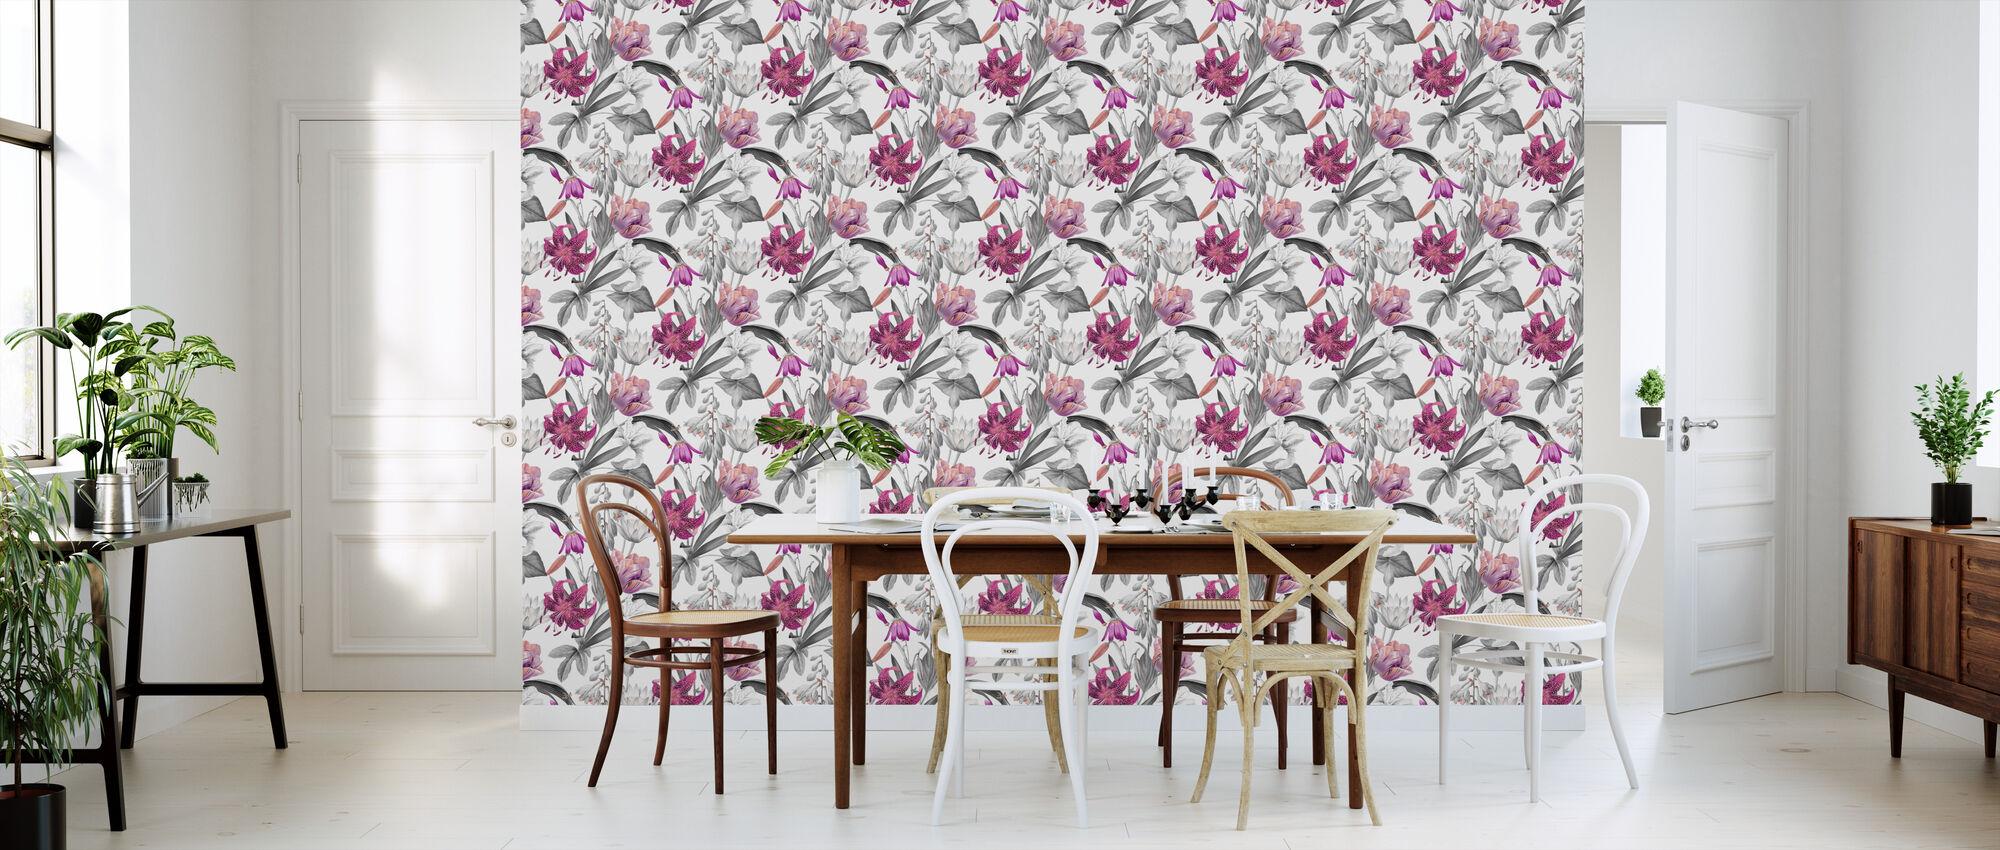 Flowers of Spring - Wallpaper - Kitchen